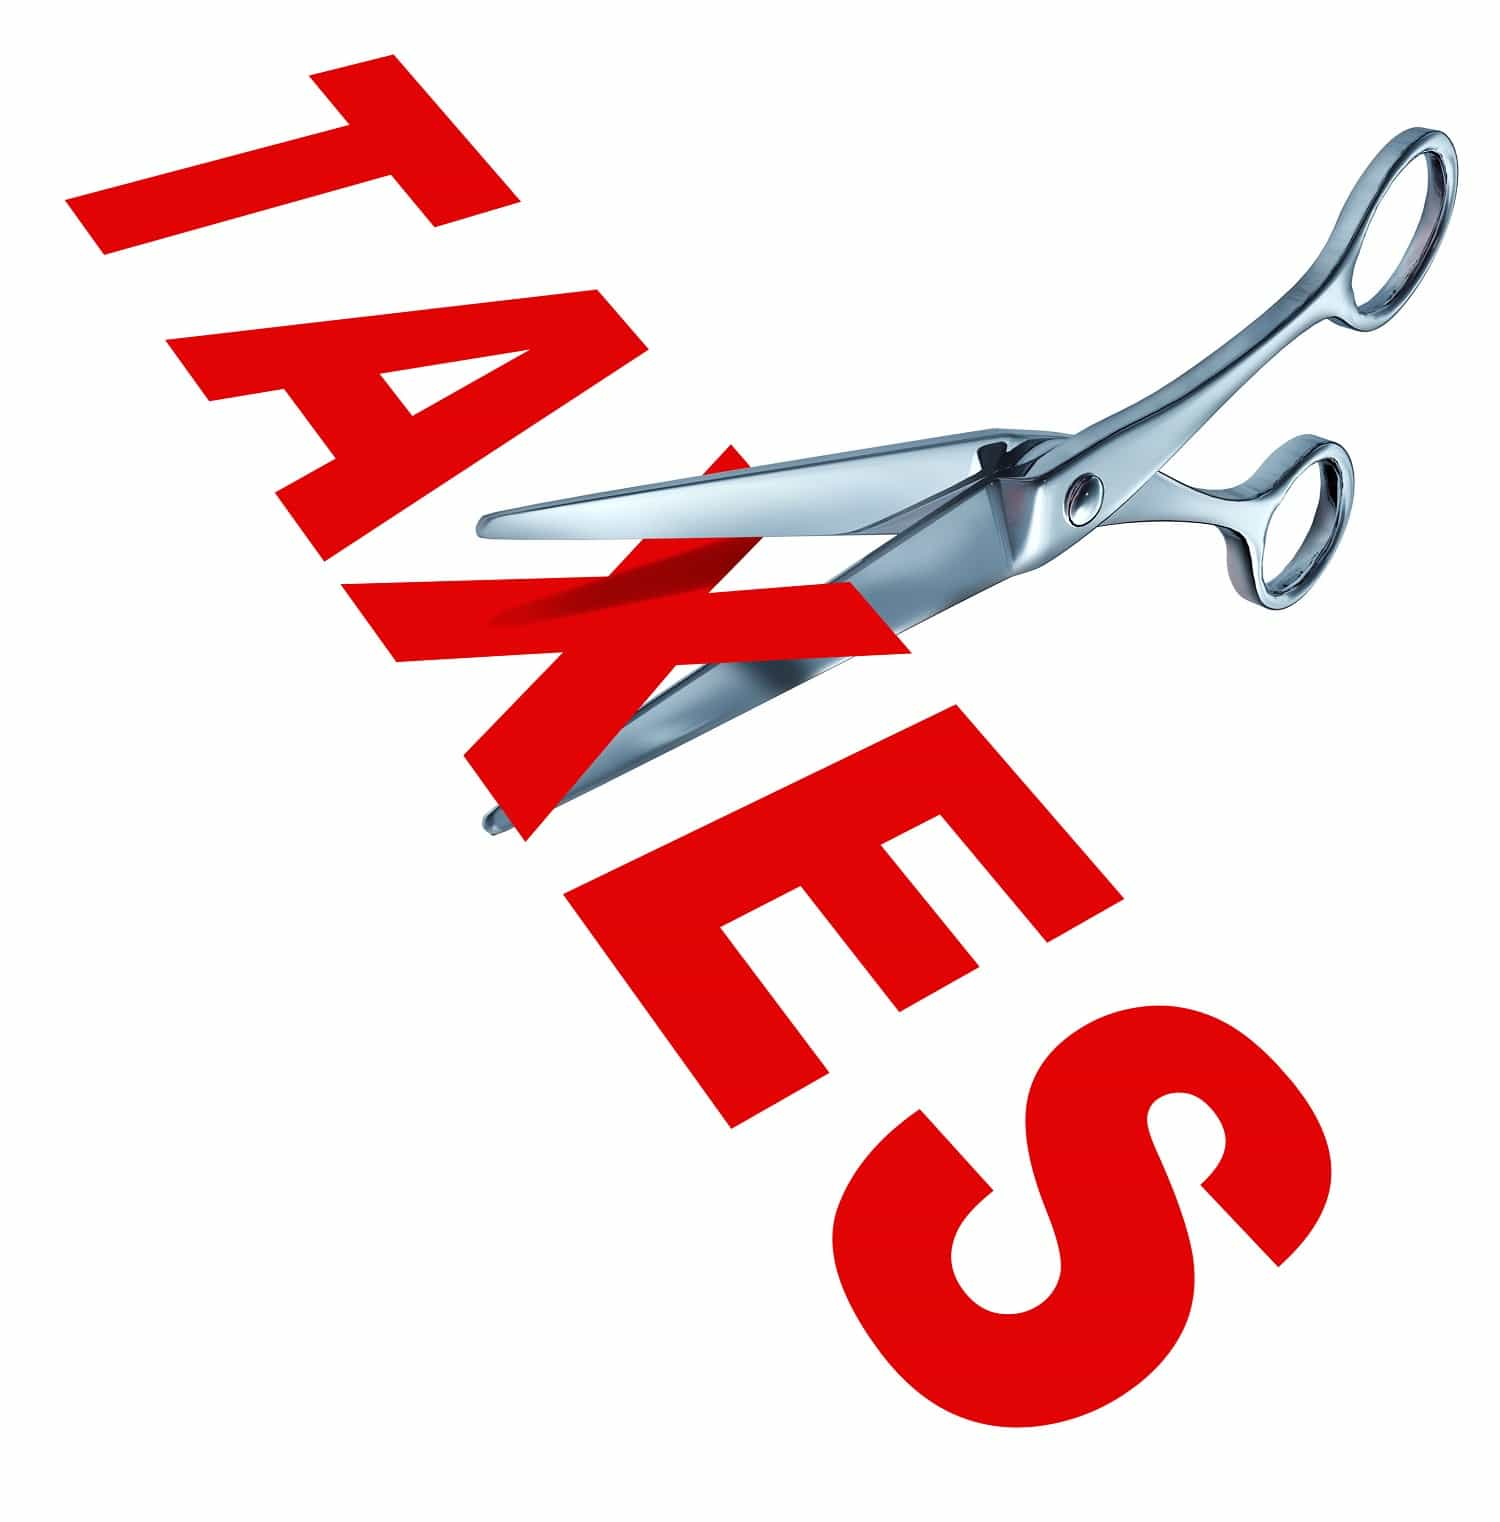 indexation capital gains tax